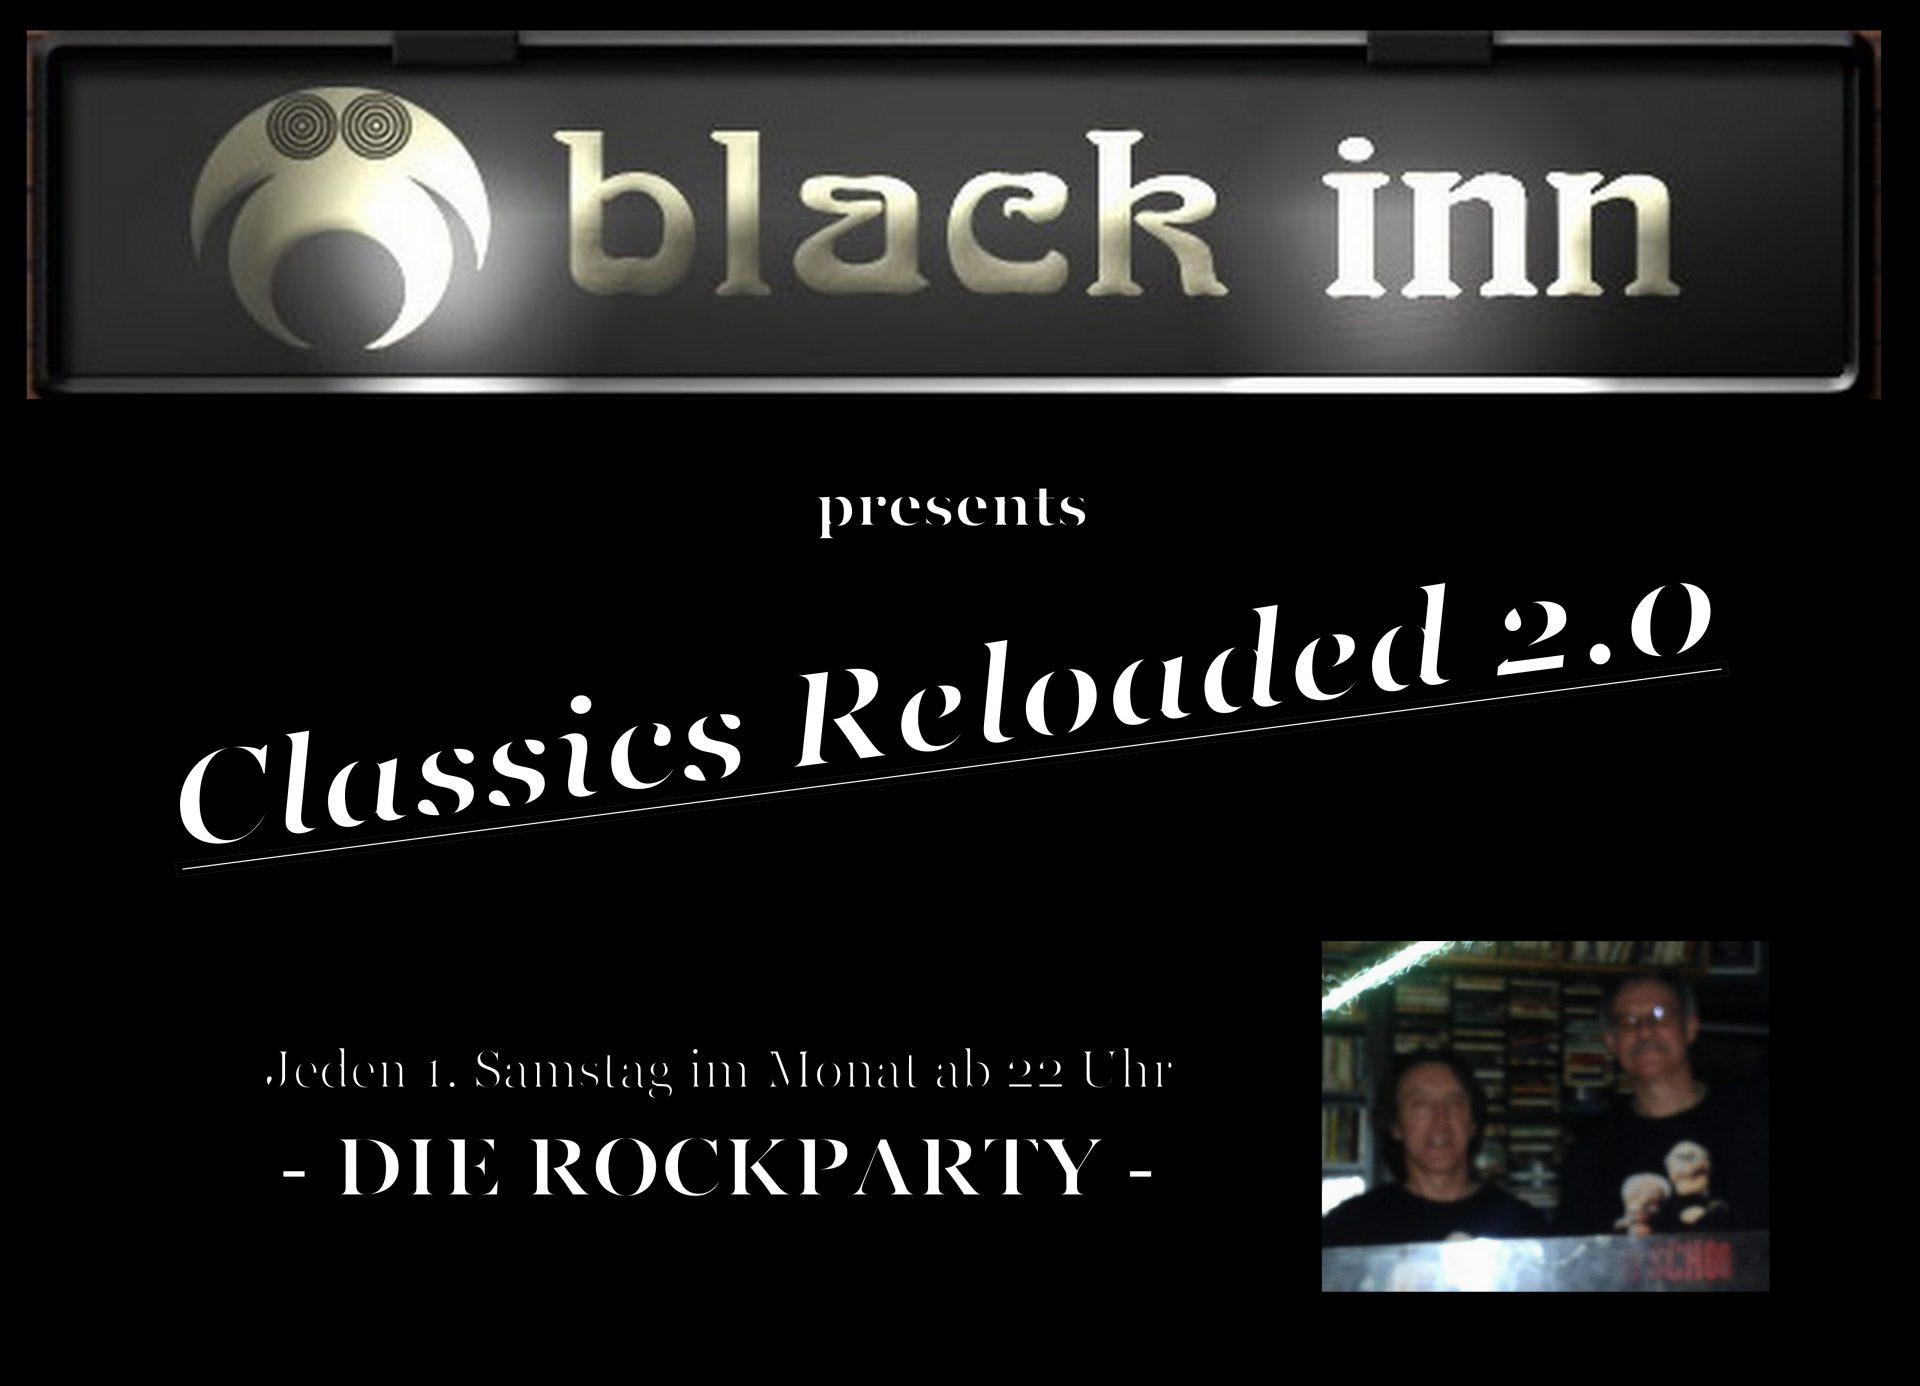 Classics Reloaded 2.0, Black Inn Ranstadt